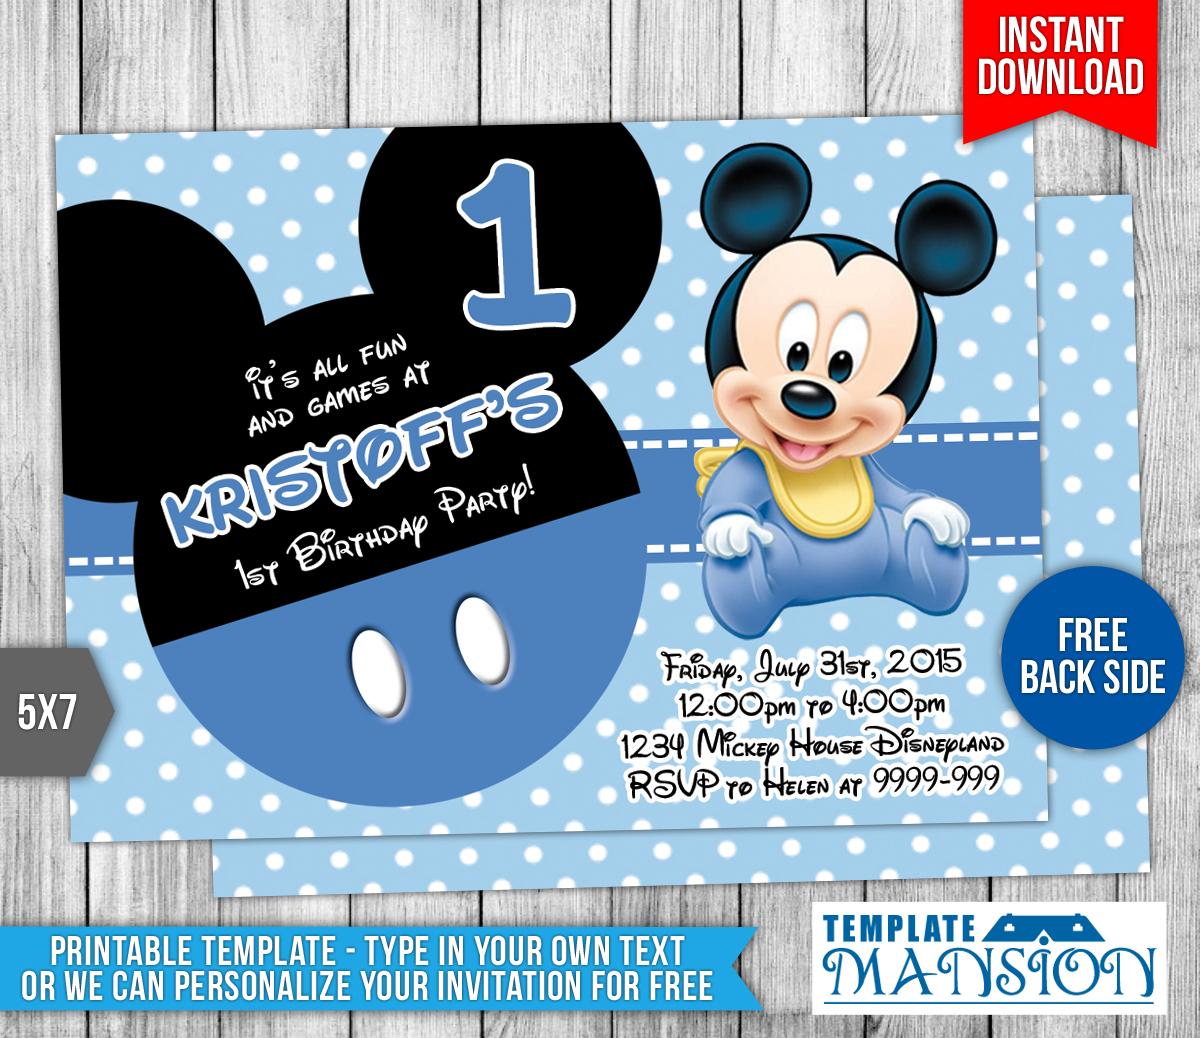 Baby Mickey Mouse Birthday Invitation By Templatemansion On Deviantart